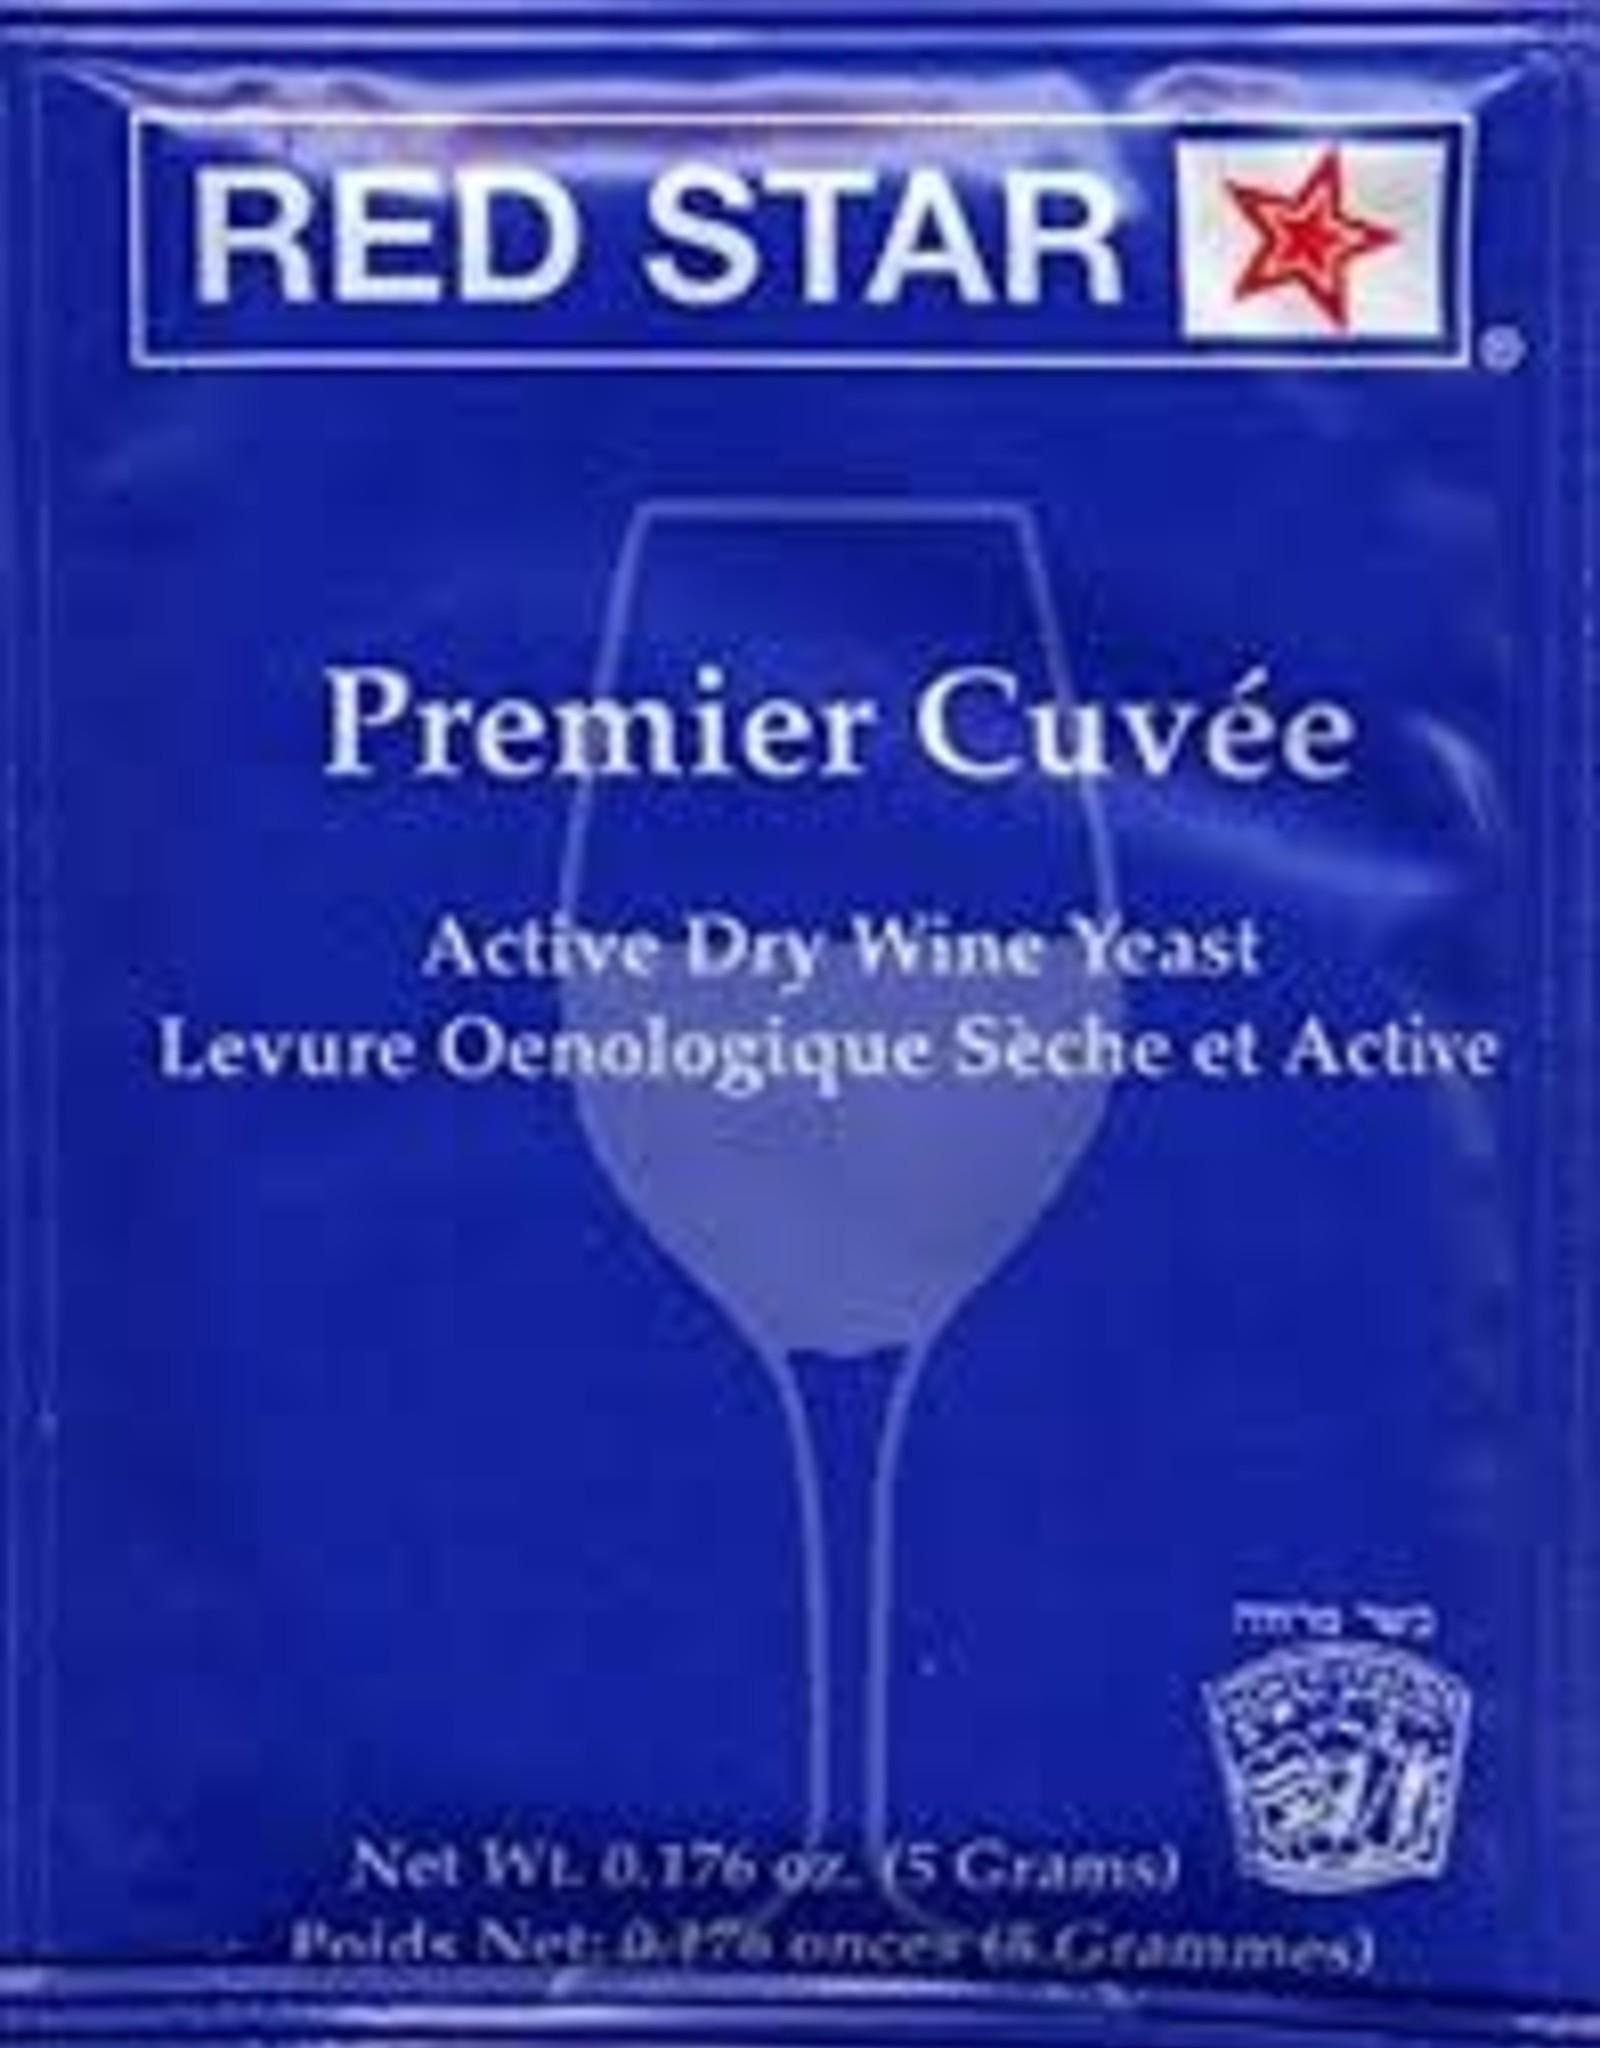 PREMIER CUVE'E RED STAR 5 GRAM WINE YEAST